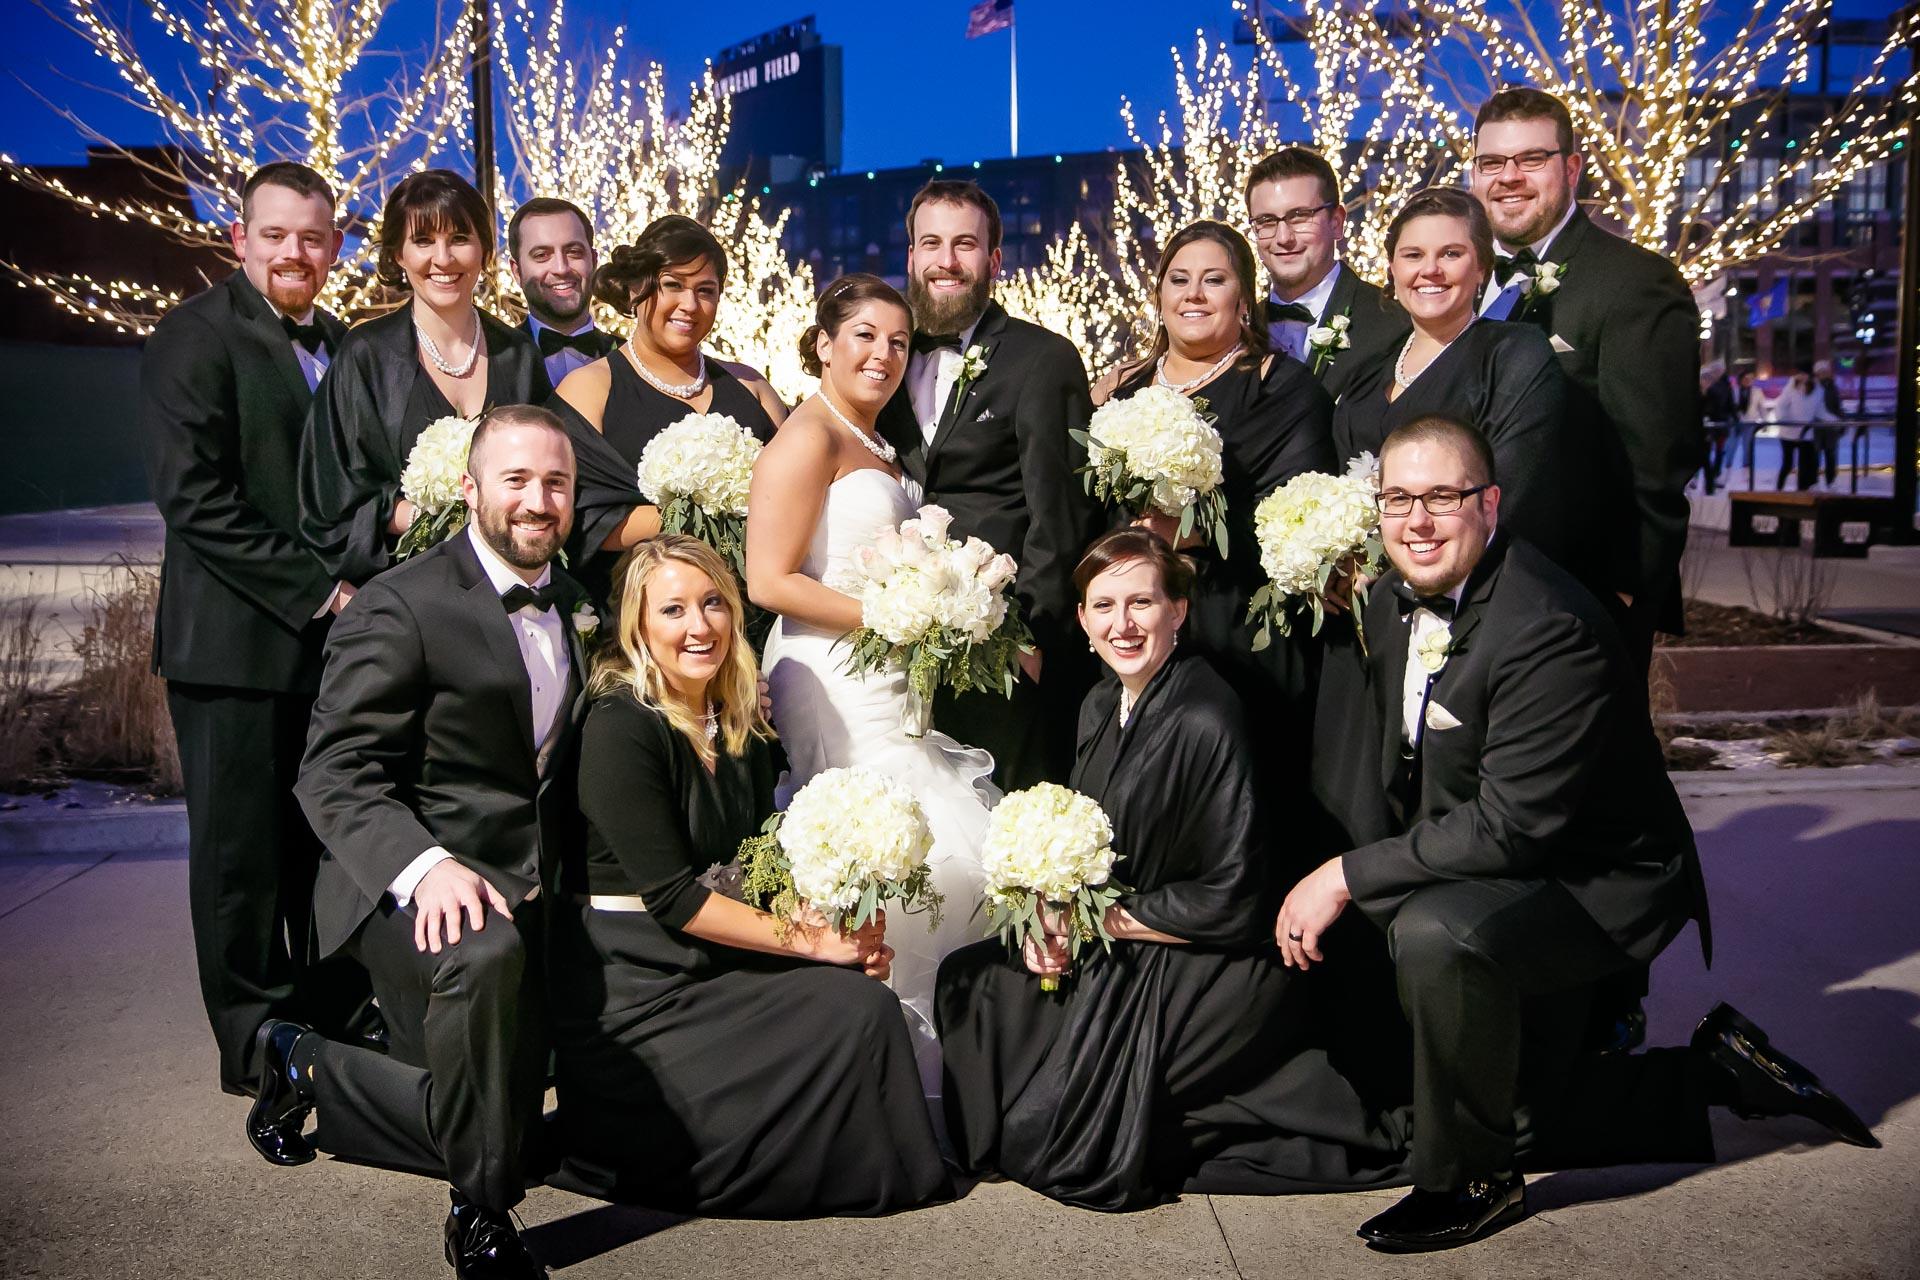 wedding-2-adam-shea-photography-green-bay-appleton-neenah-photographer-23.jpg